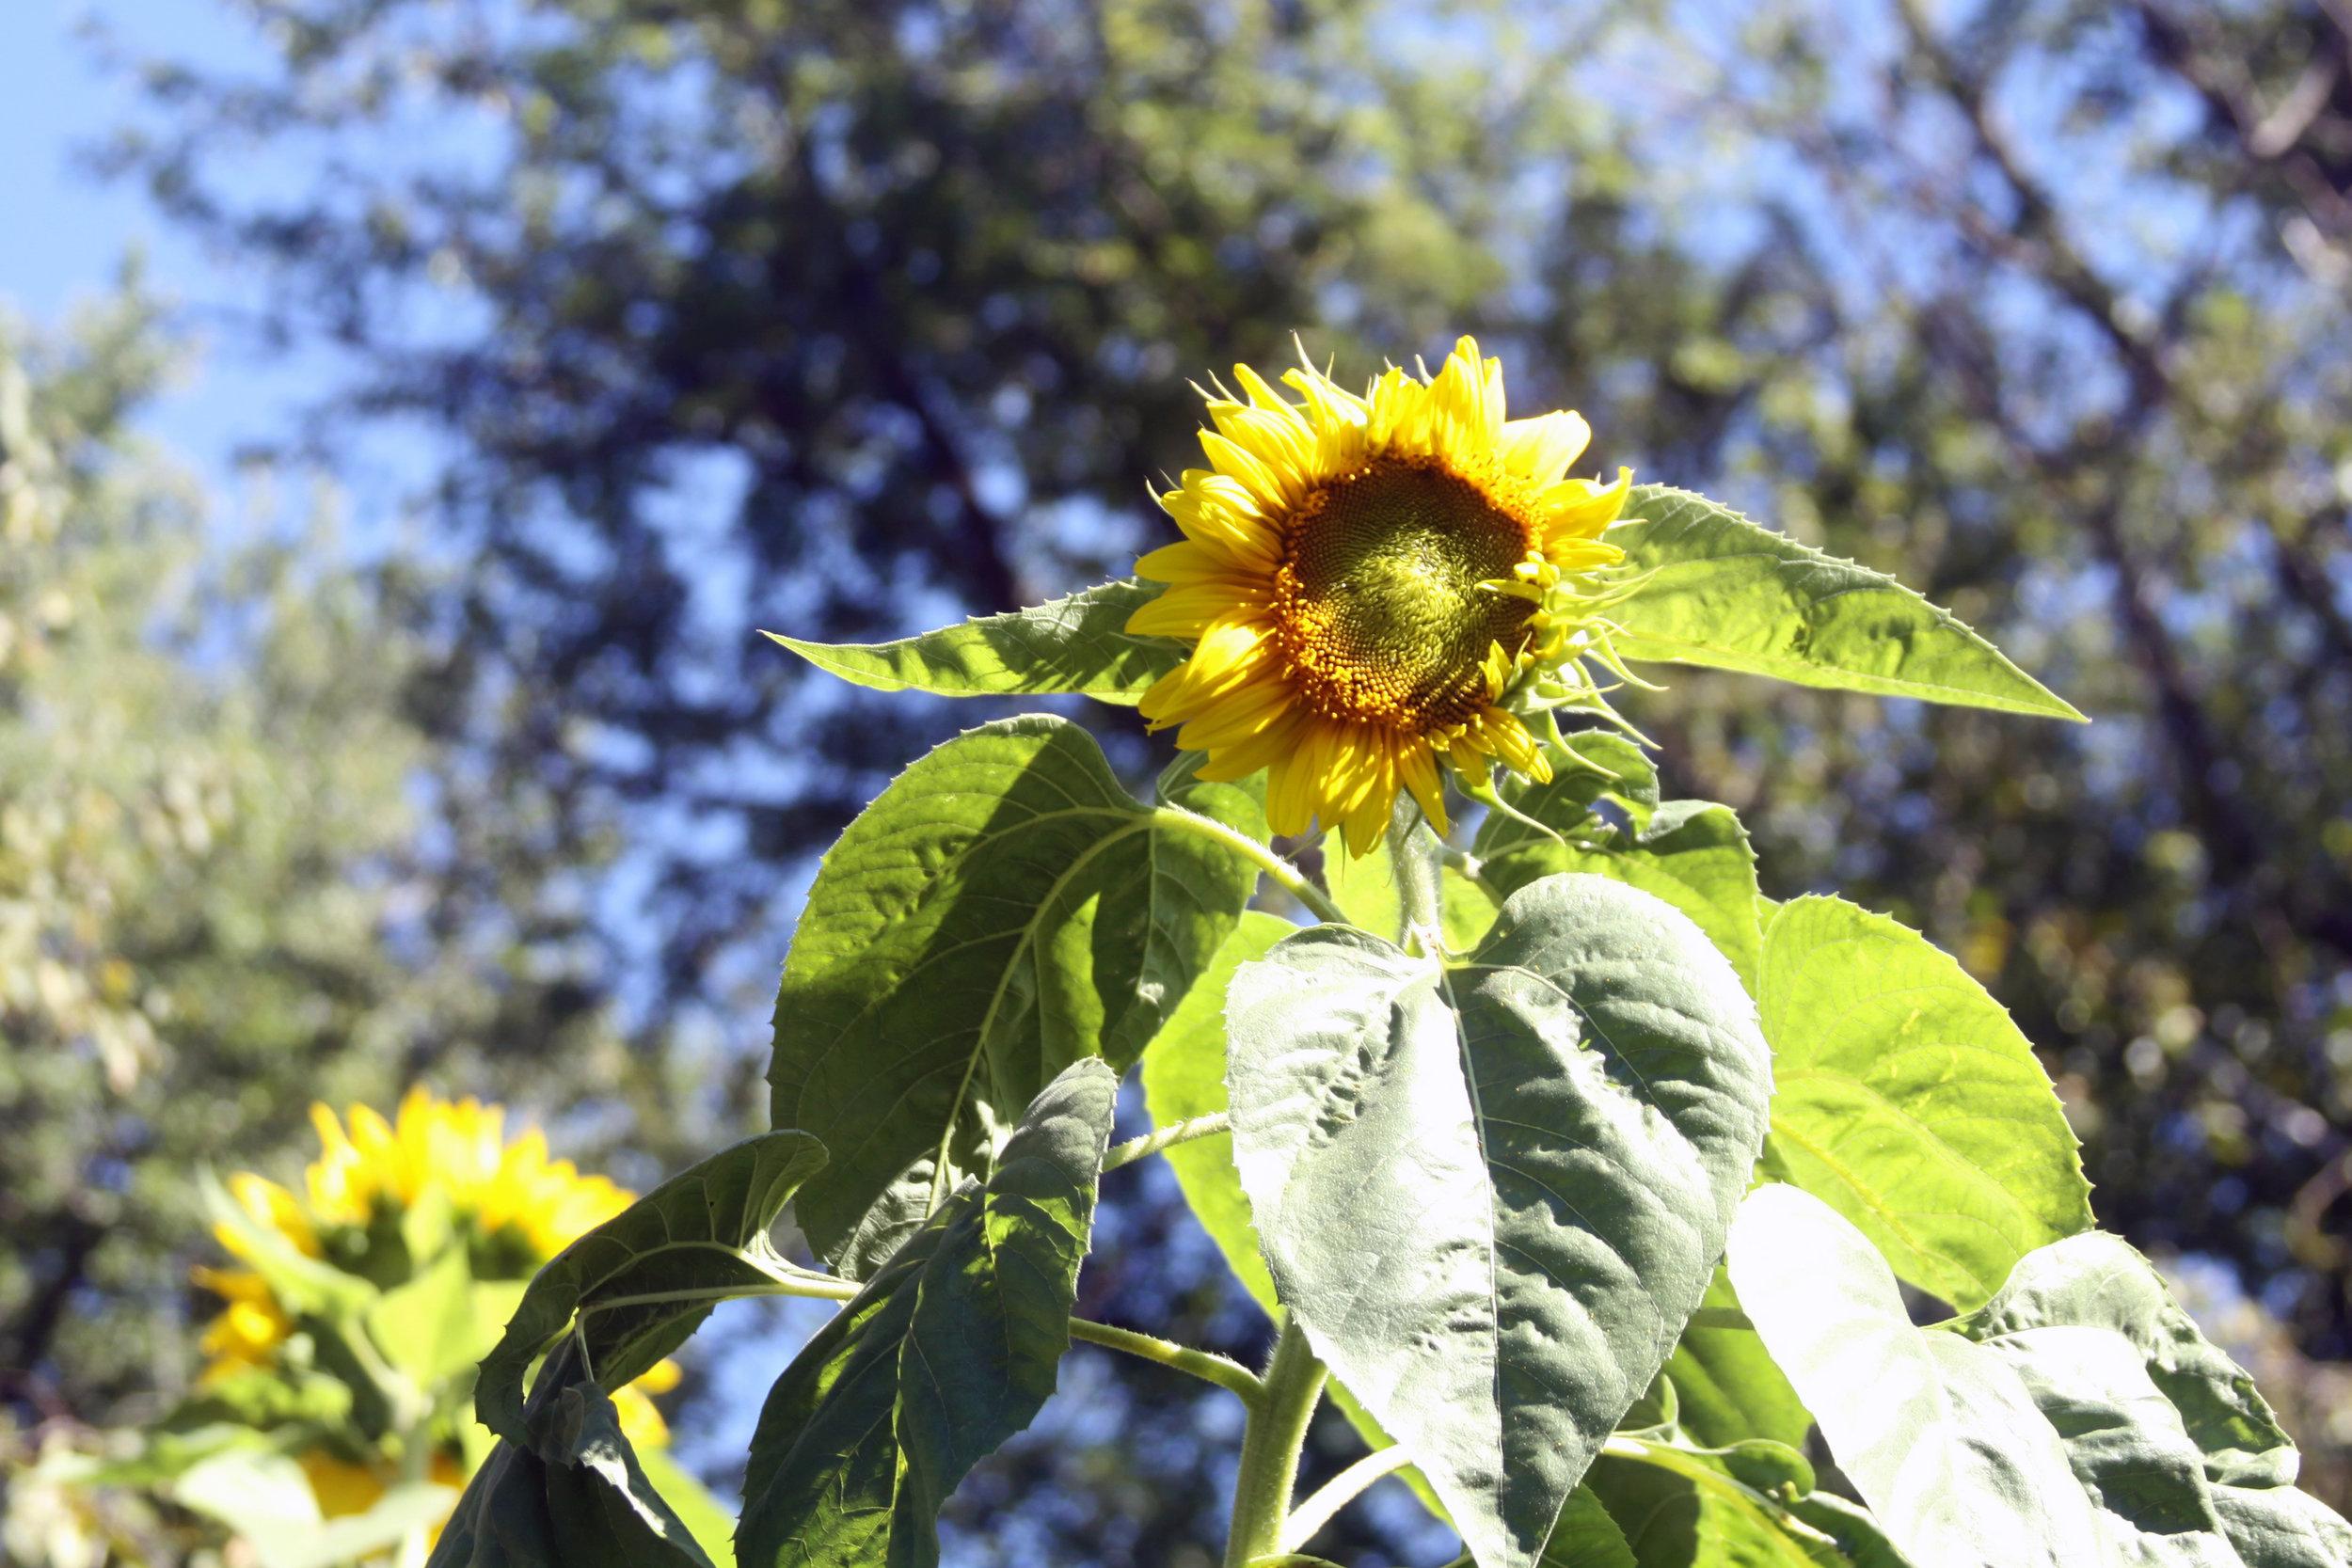 Sunflowers Blooming in My September Garden